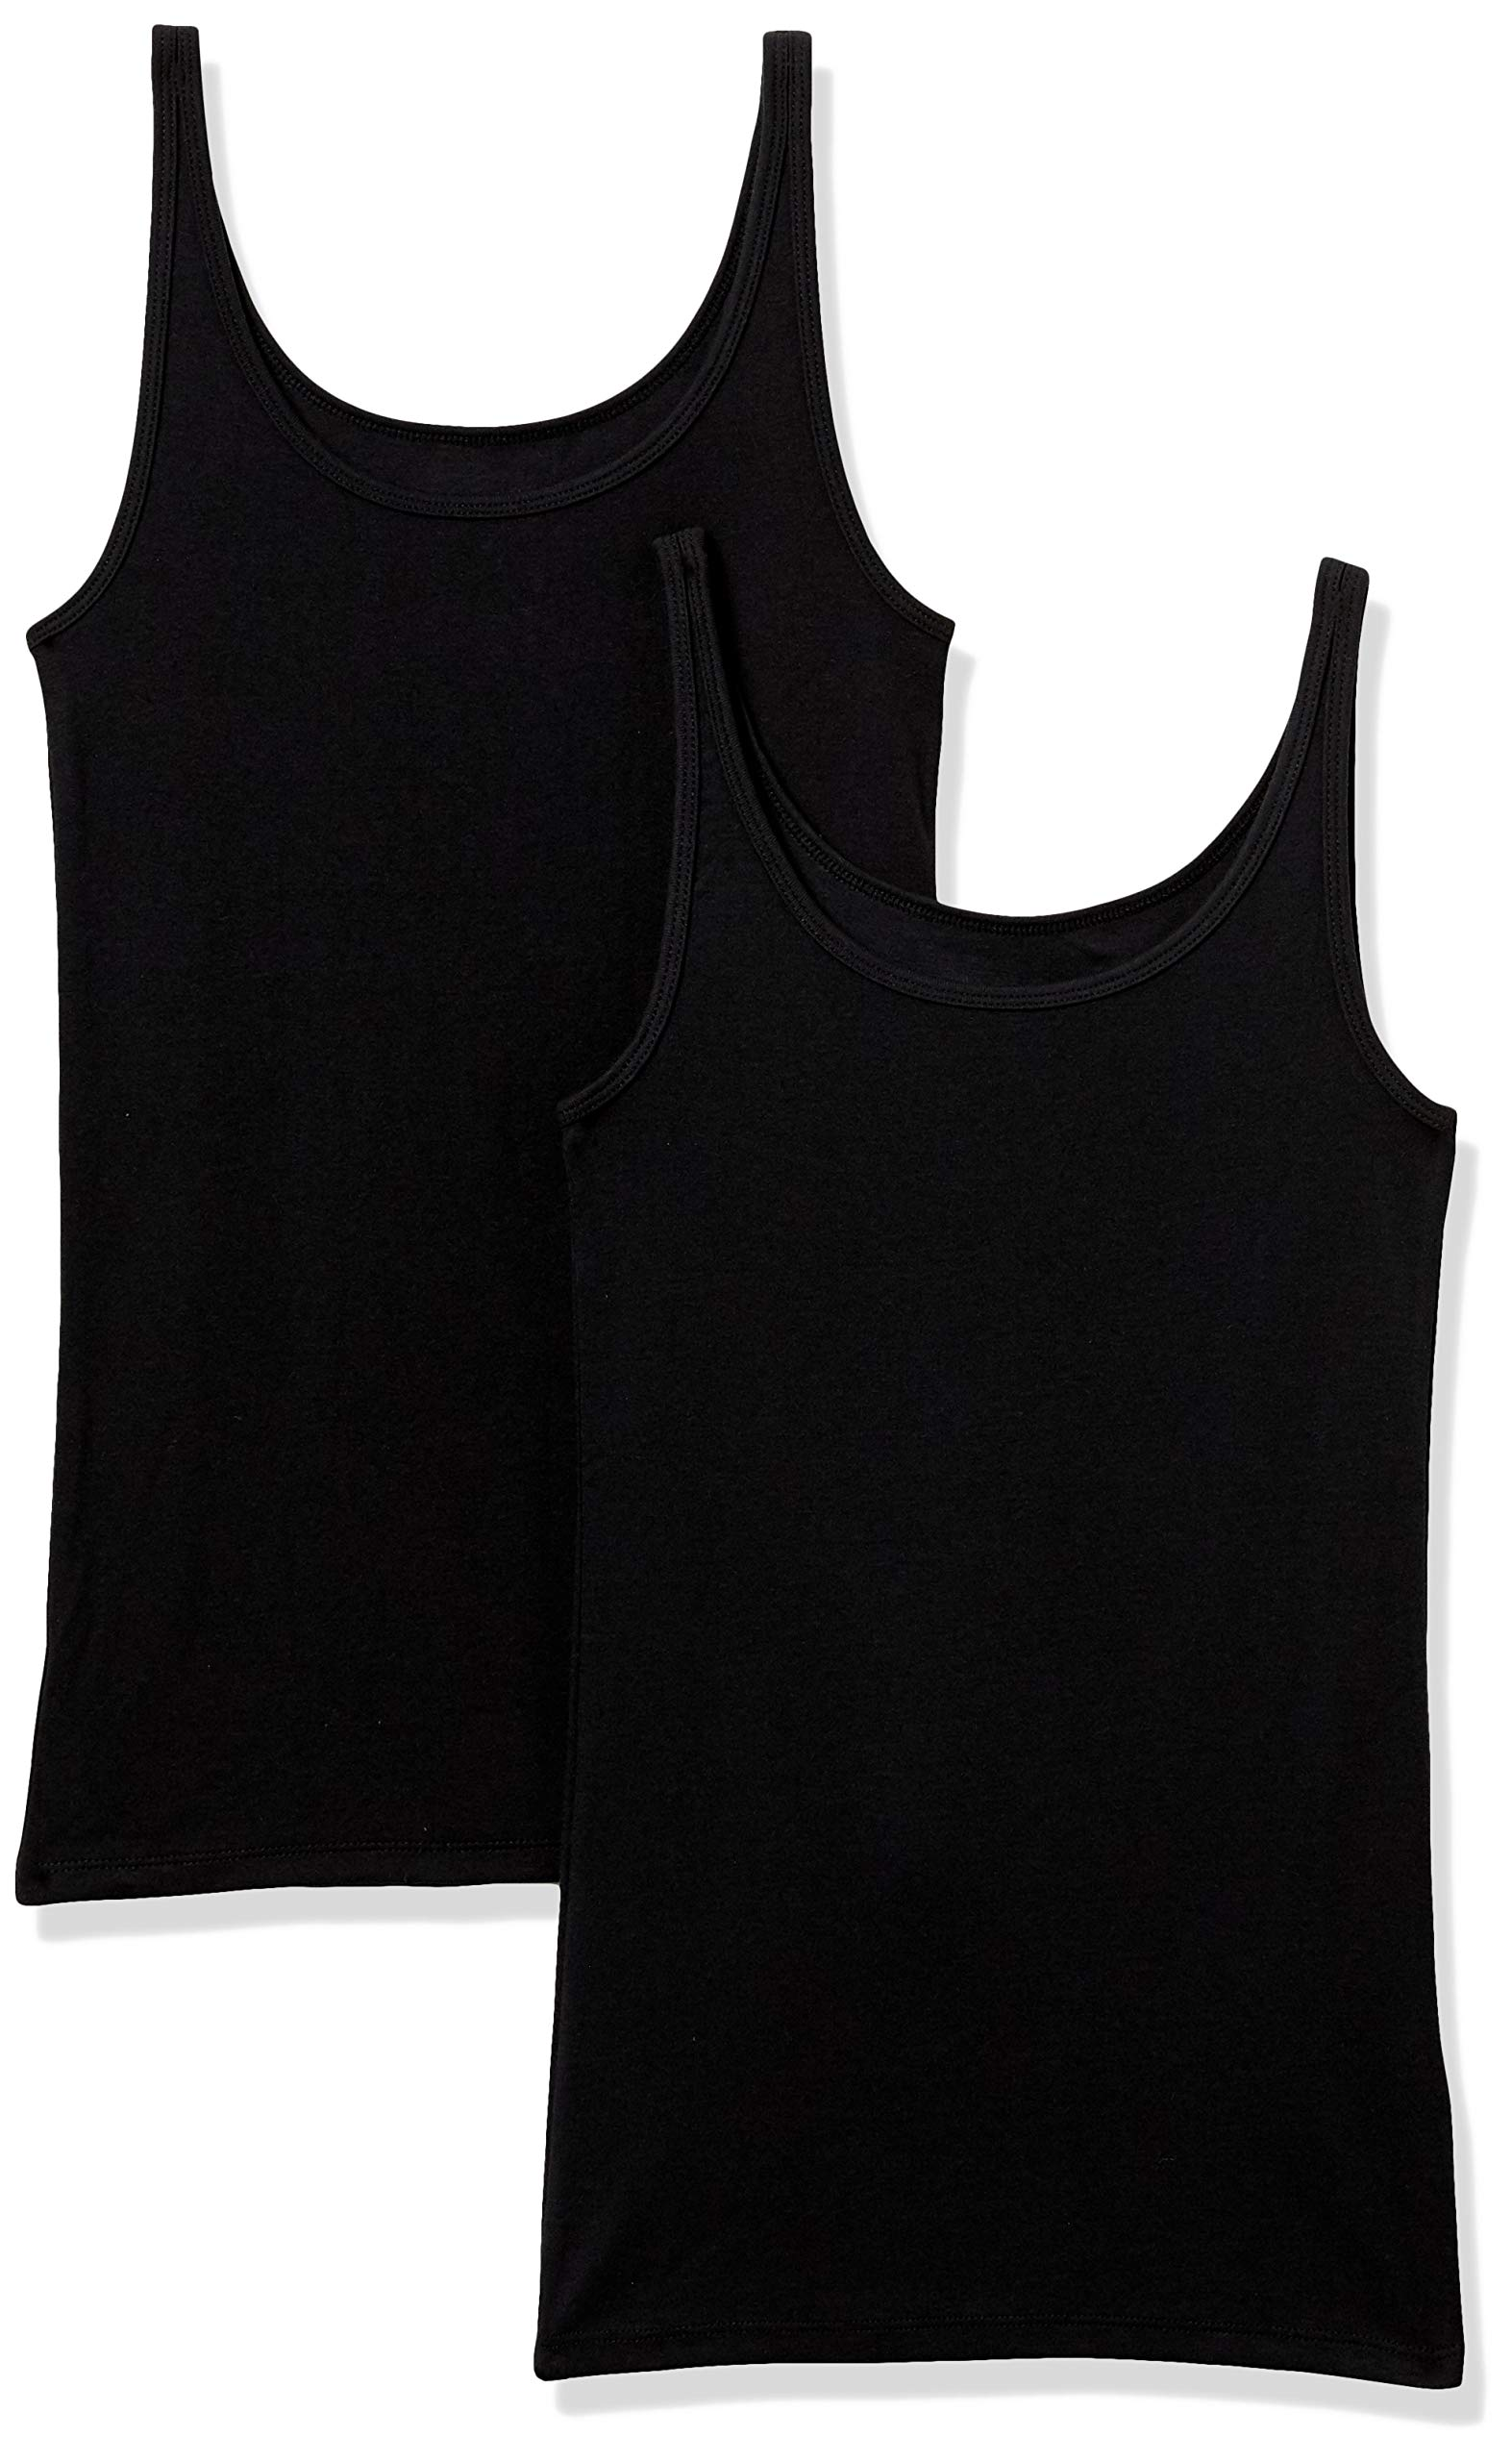 Amazon Essentials Women's 2-Pack Slim-fit Thin Strap Tank